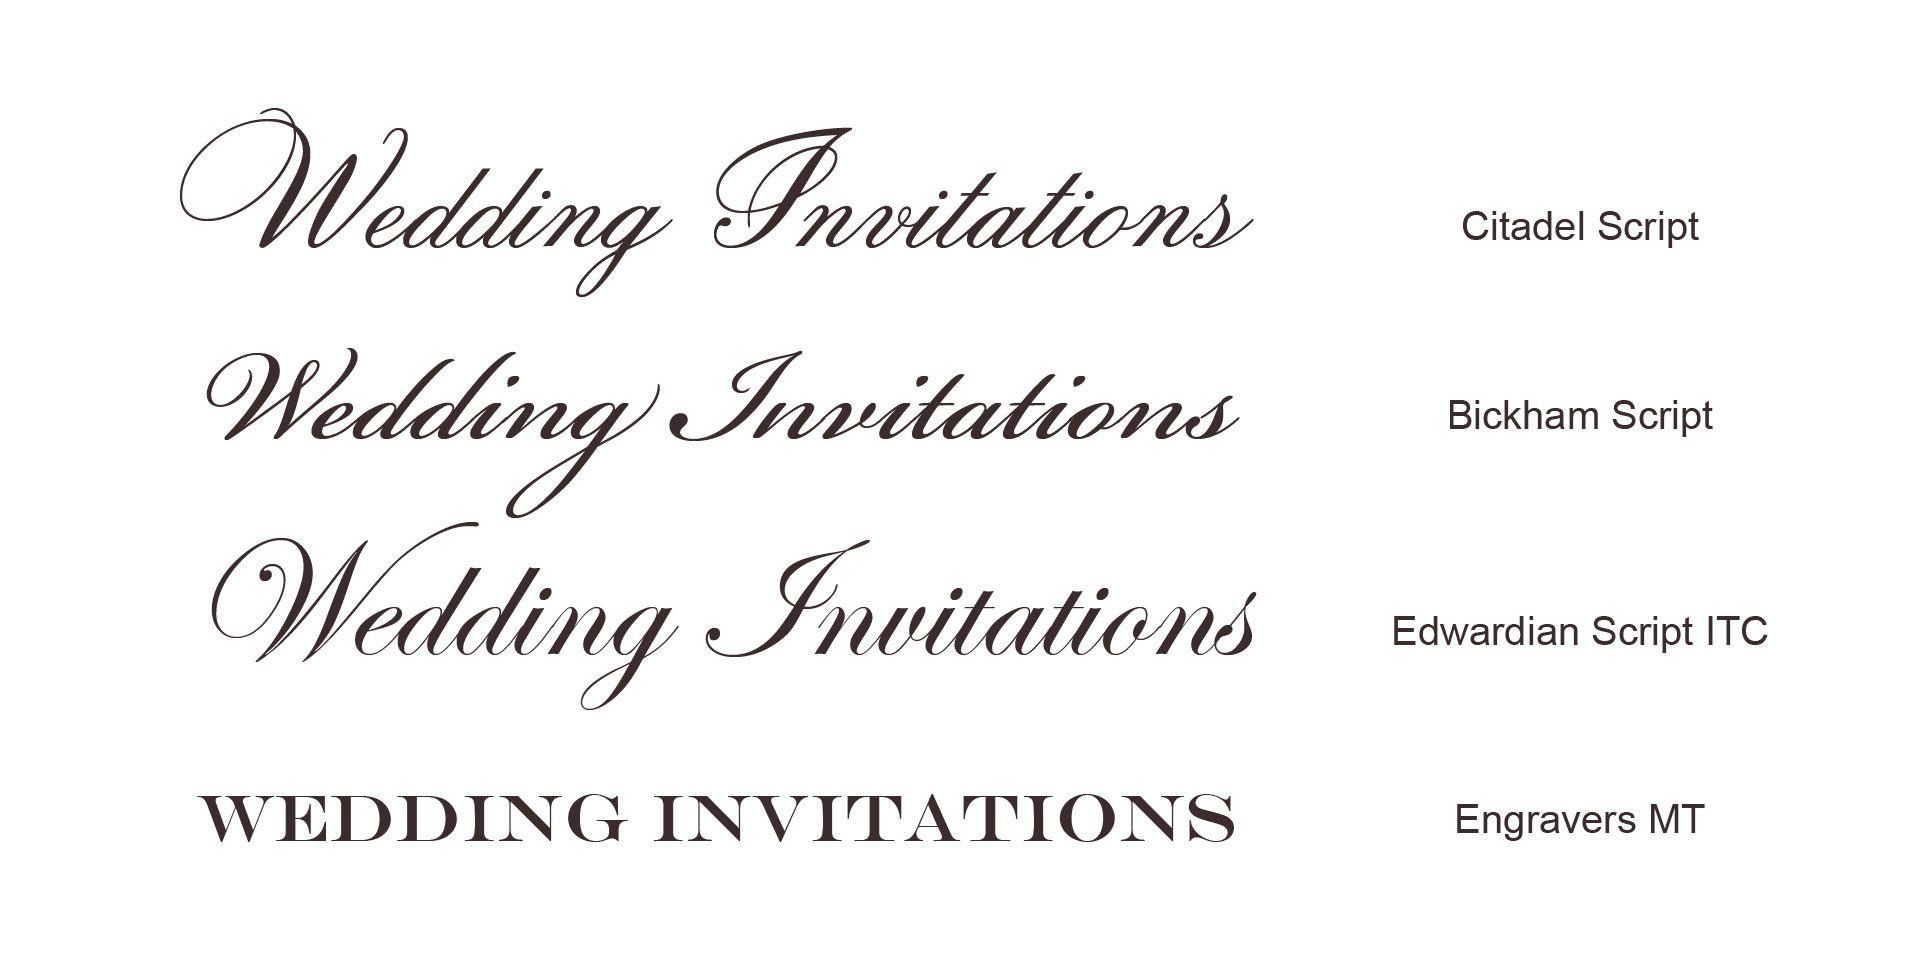 Wedding invitations in french wording tattoos